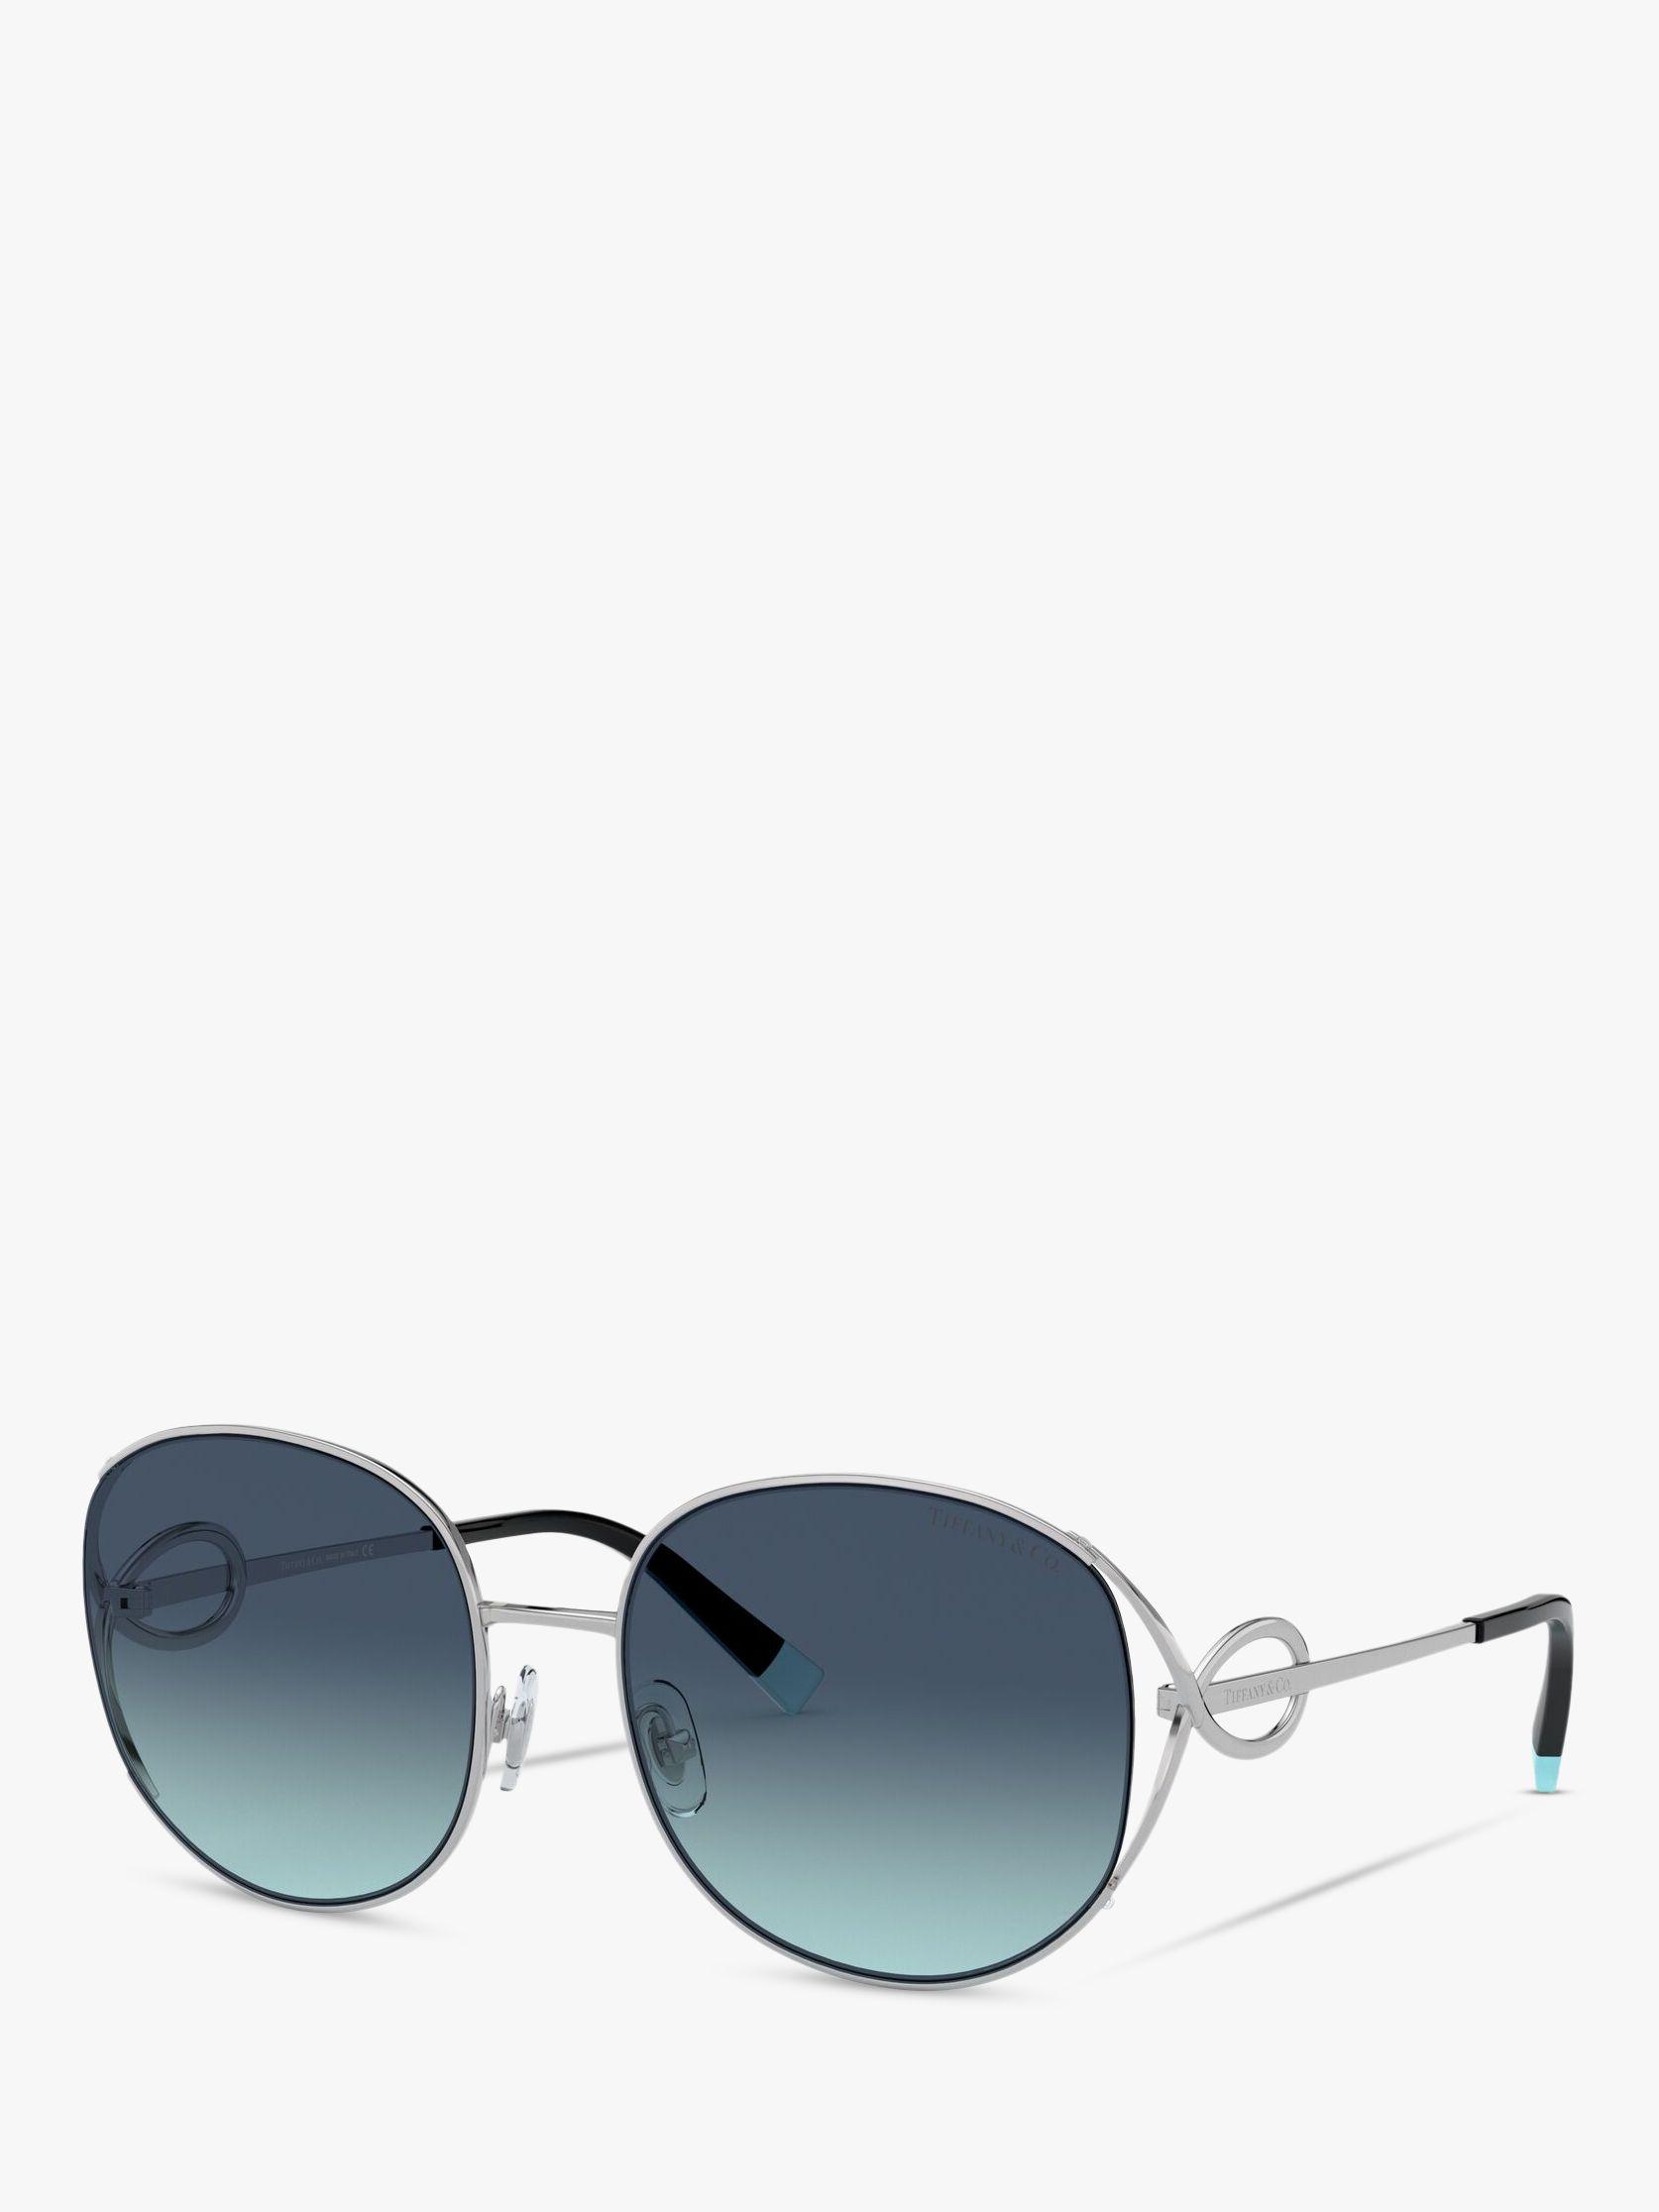 Tiffany & Co Tiffany & Co TF3065 Women's Oval Sunglasses, Silver/Blue Gradient